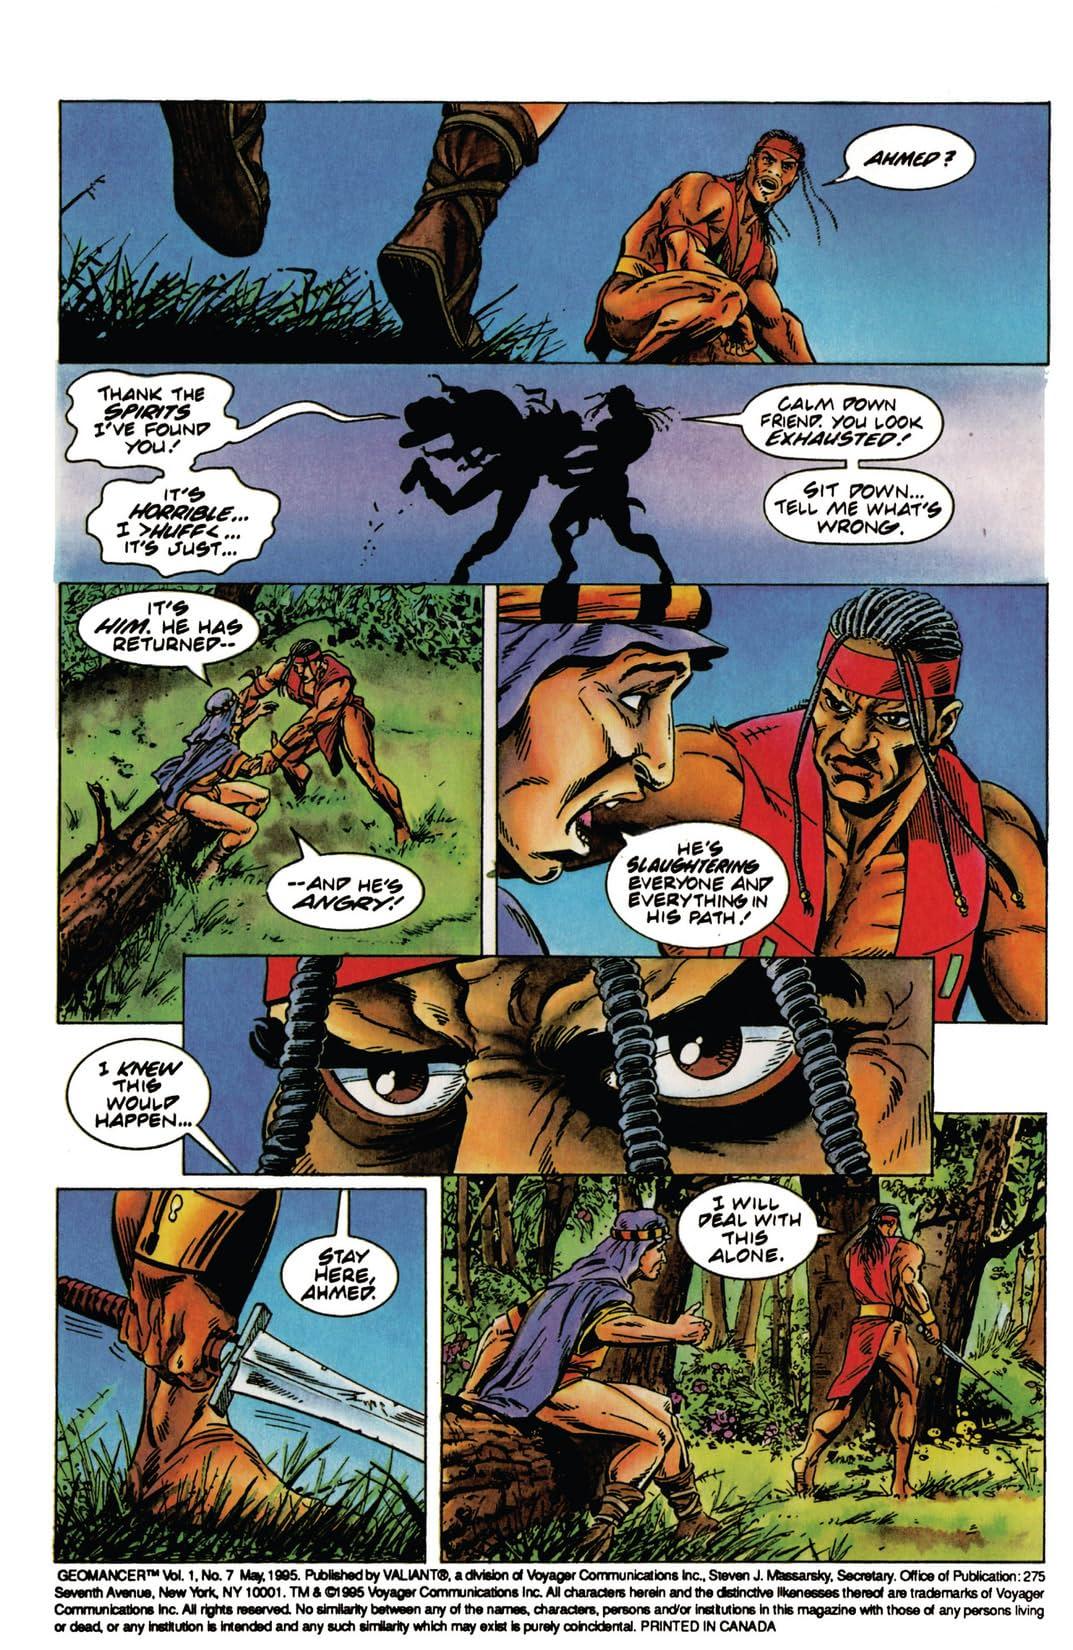 Geomancer (1994) #7